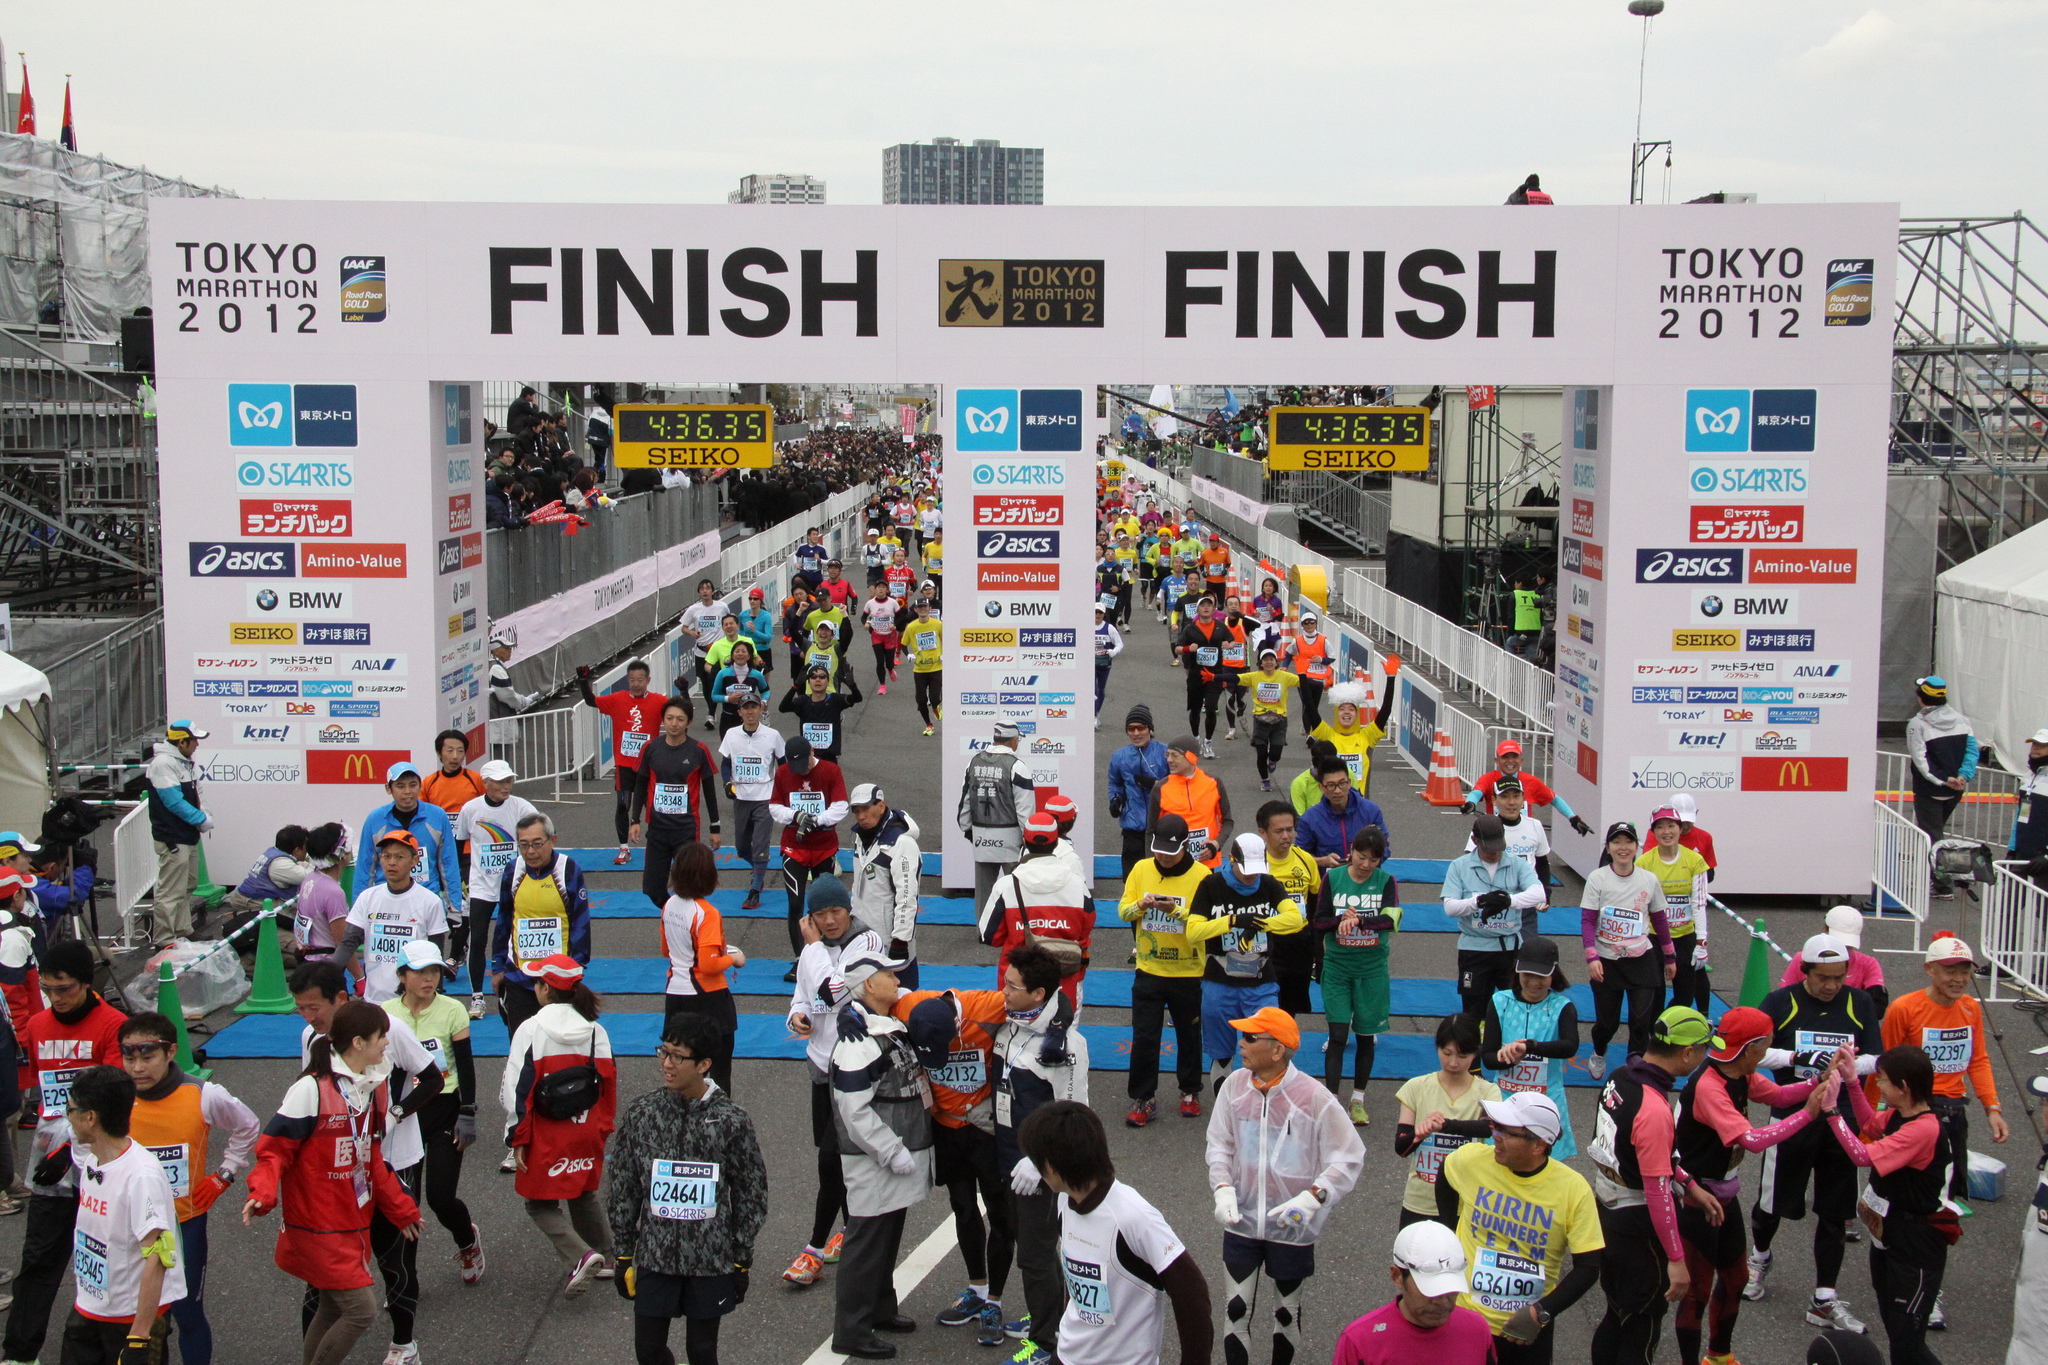 Tokyo Finish